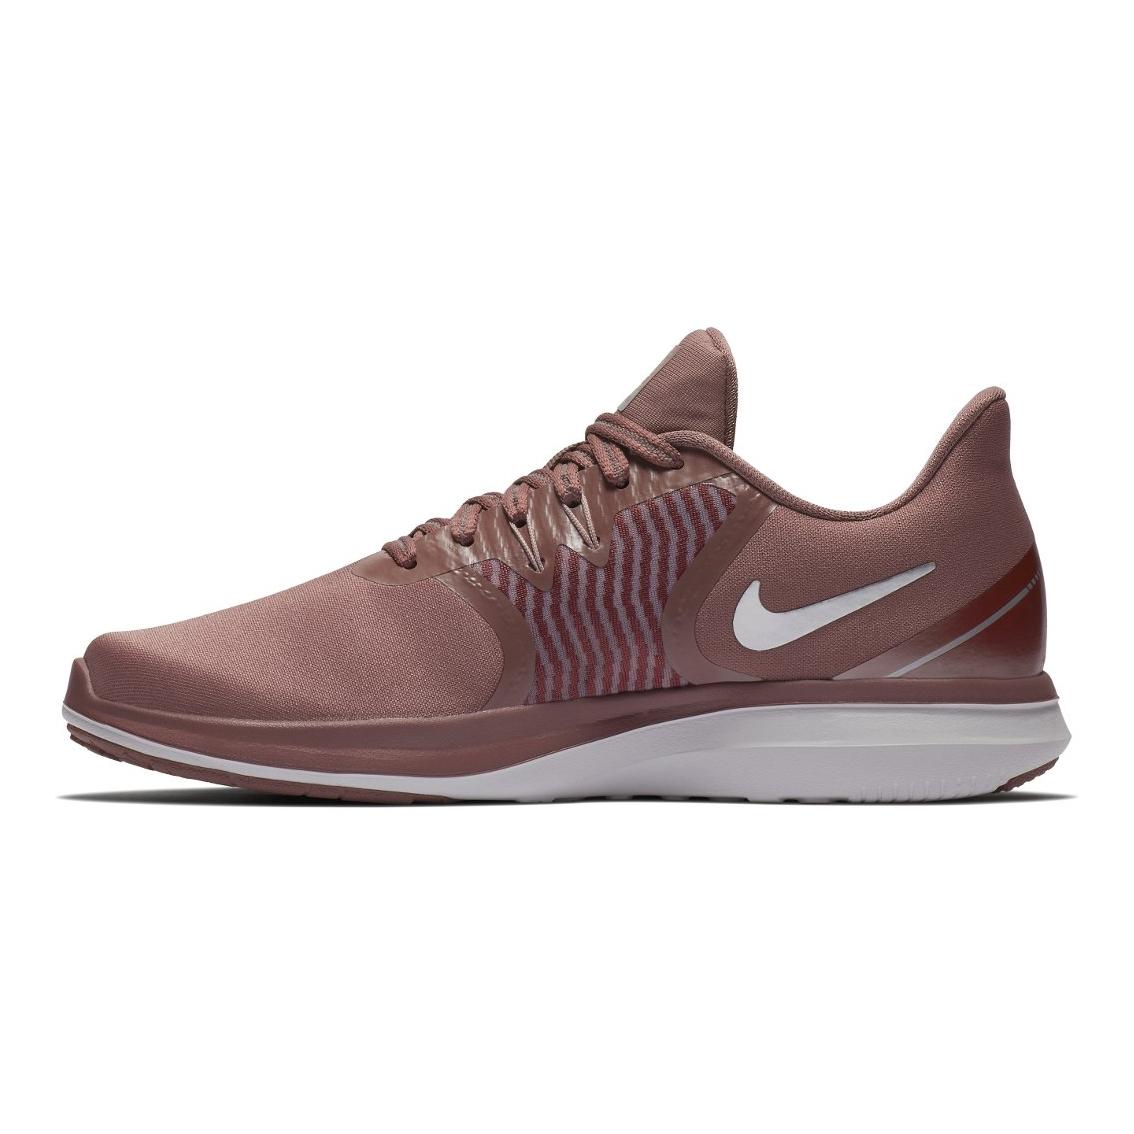 57288ecf700406 Nike Women s In-Season TR 8 Print Training Shoes- Smokey Mauve ...